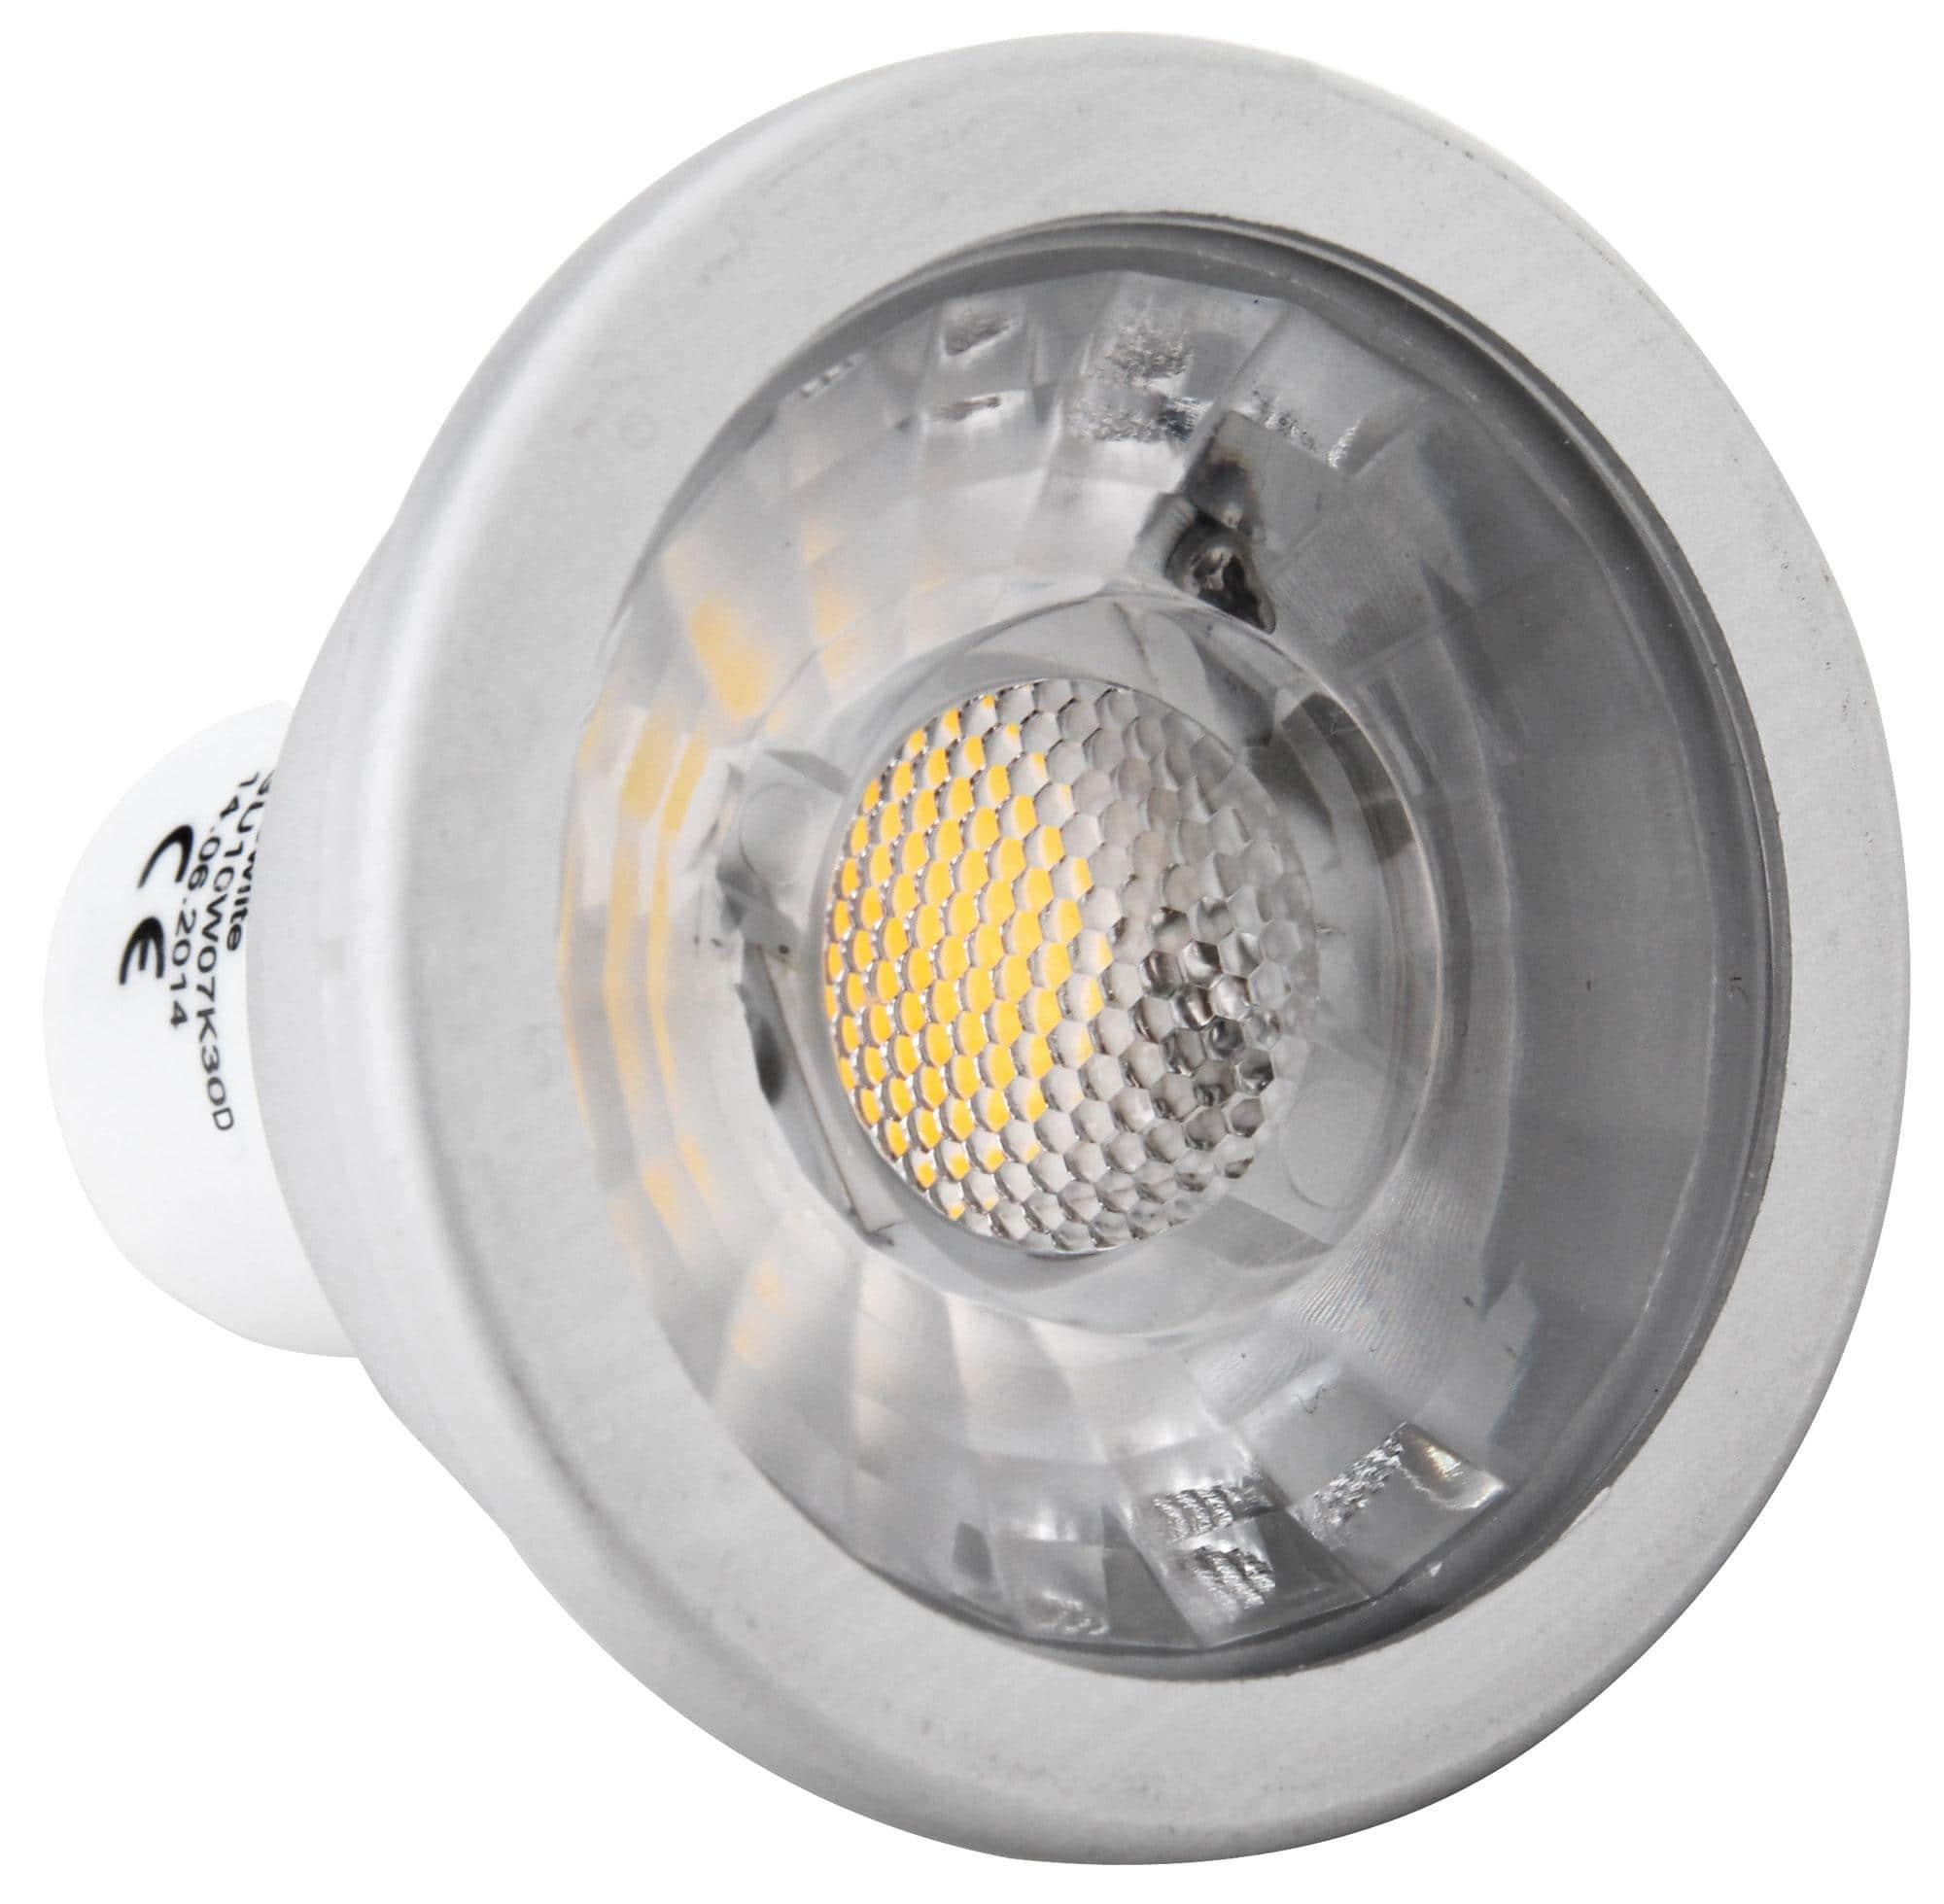 showlite led spot cob gu10w07k30d 7 watt 550 lumen sockel gu10 3000 kelvin dimmbar. Black Bedroom Furniture Sets. Home Design Ideas